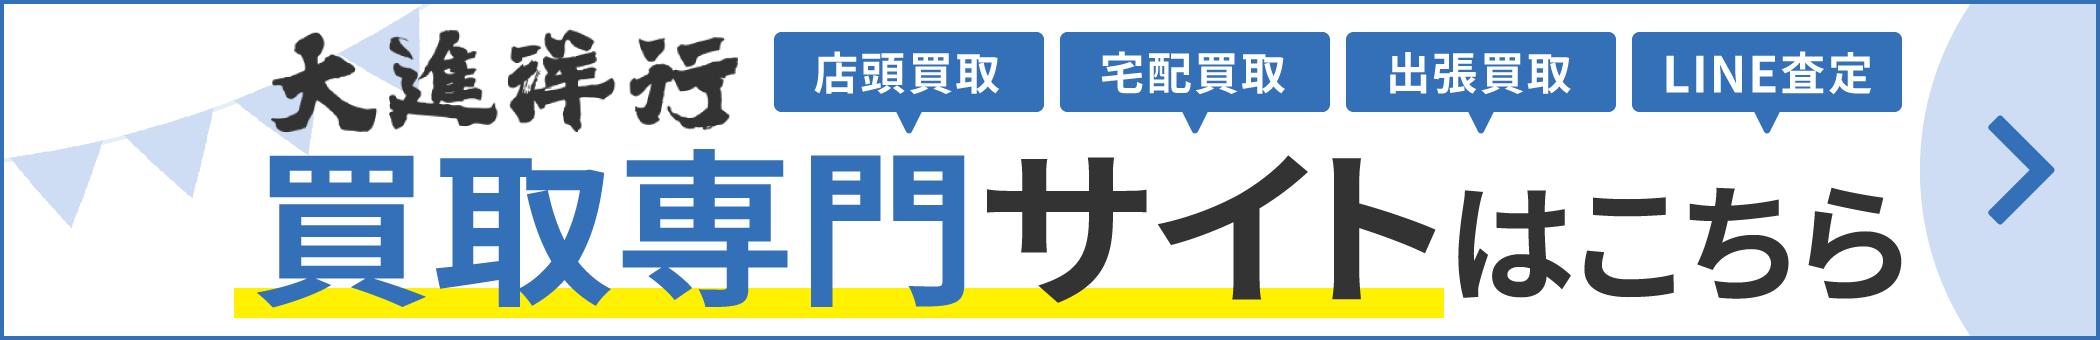 大進洋行 買取専門サイト